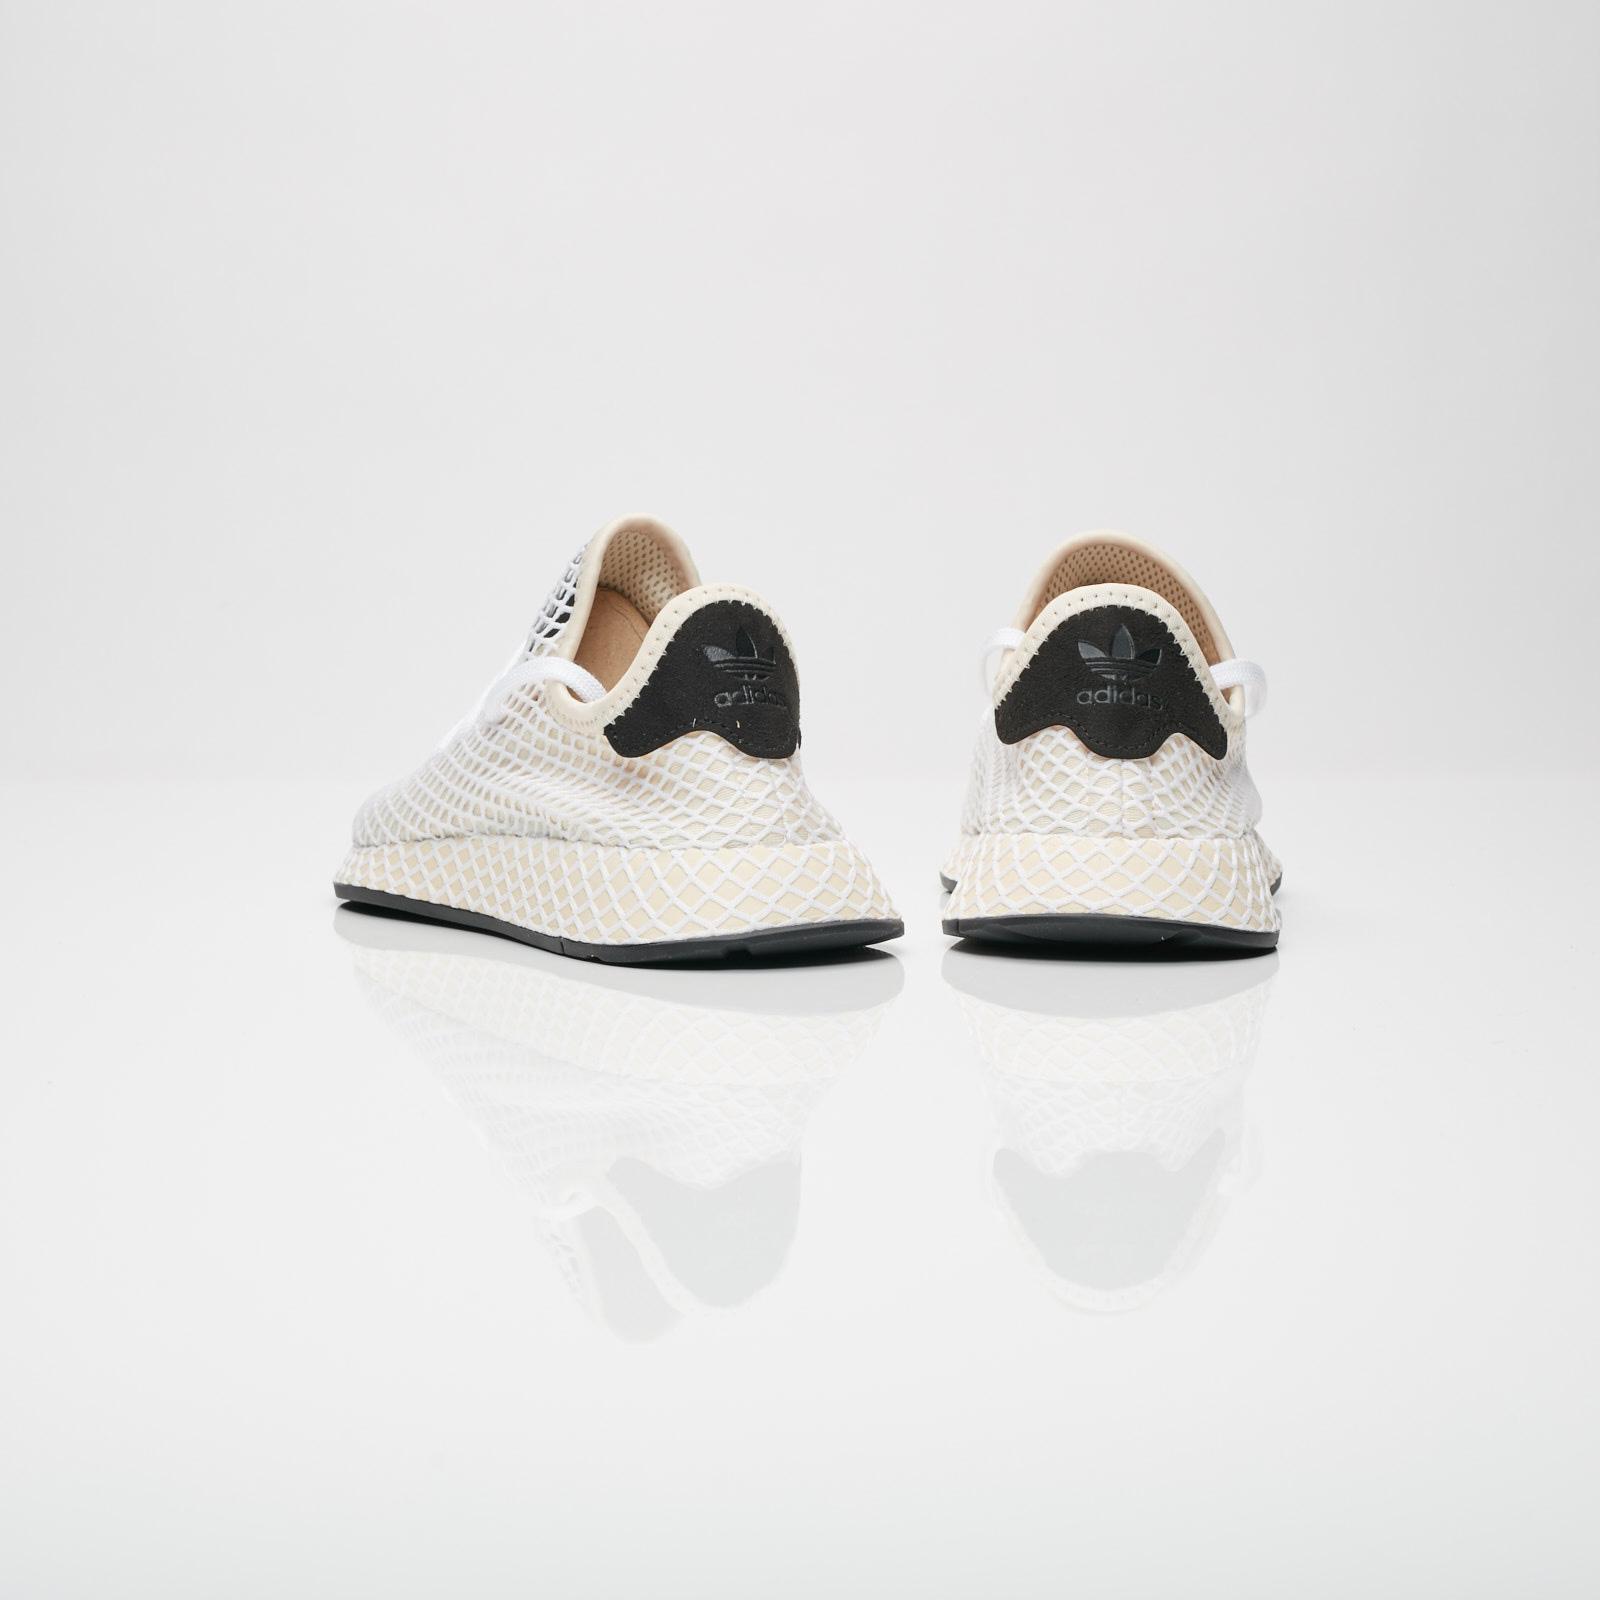 quality design 36f47 a2450 adidas Originals Deerupt Runner W adidas Originals Deerupt Runner W ...